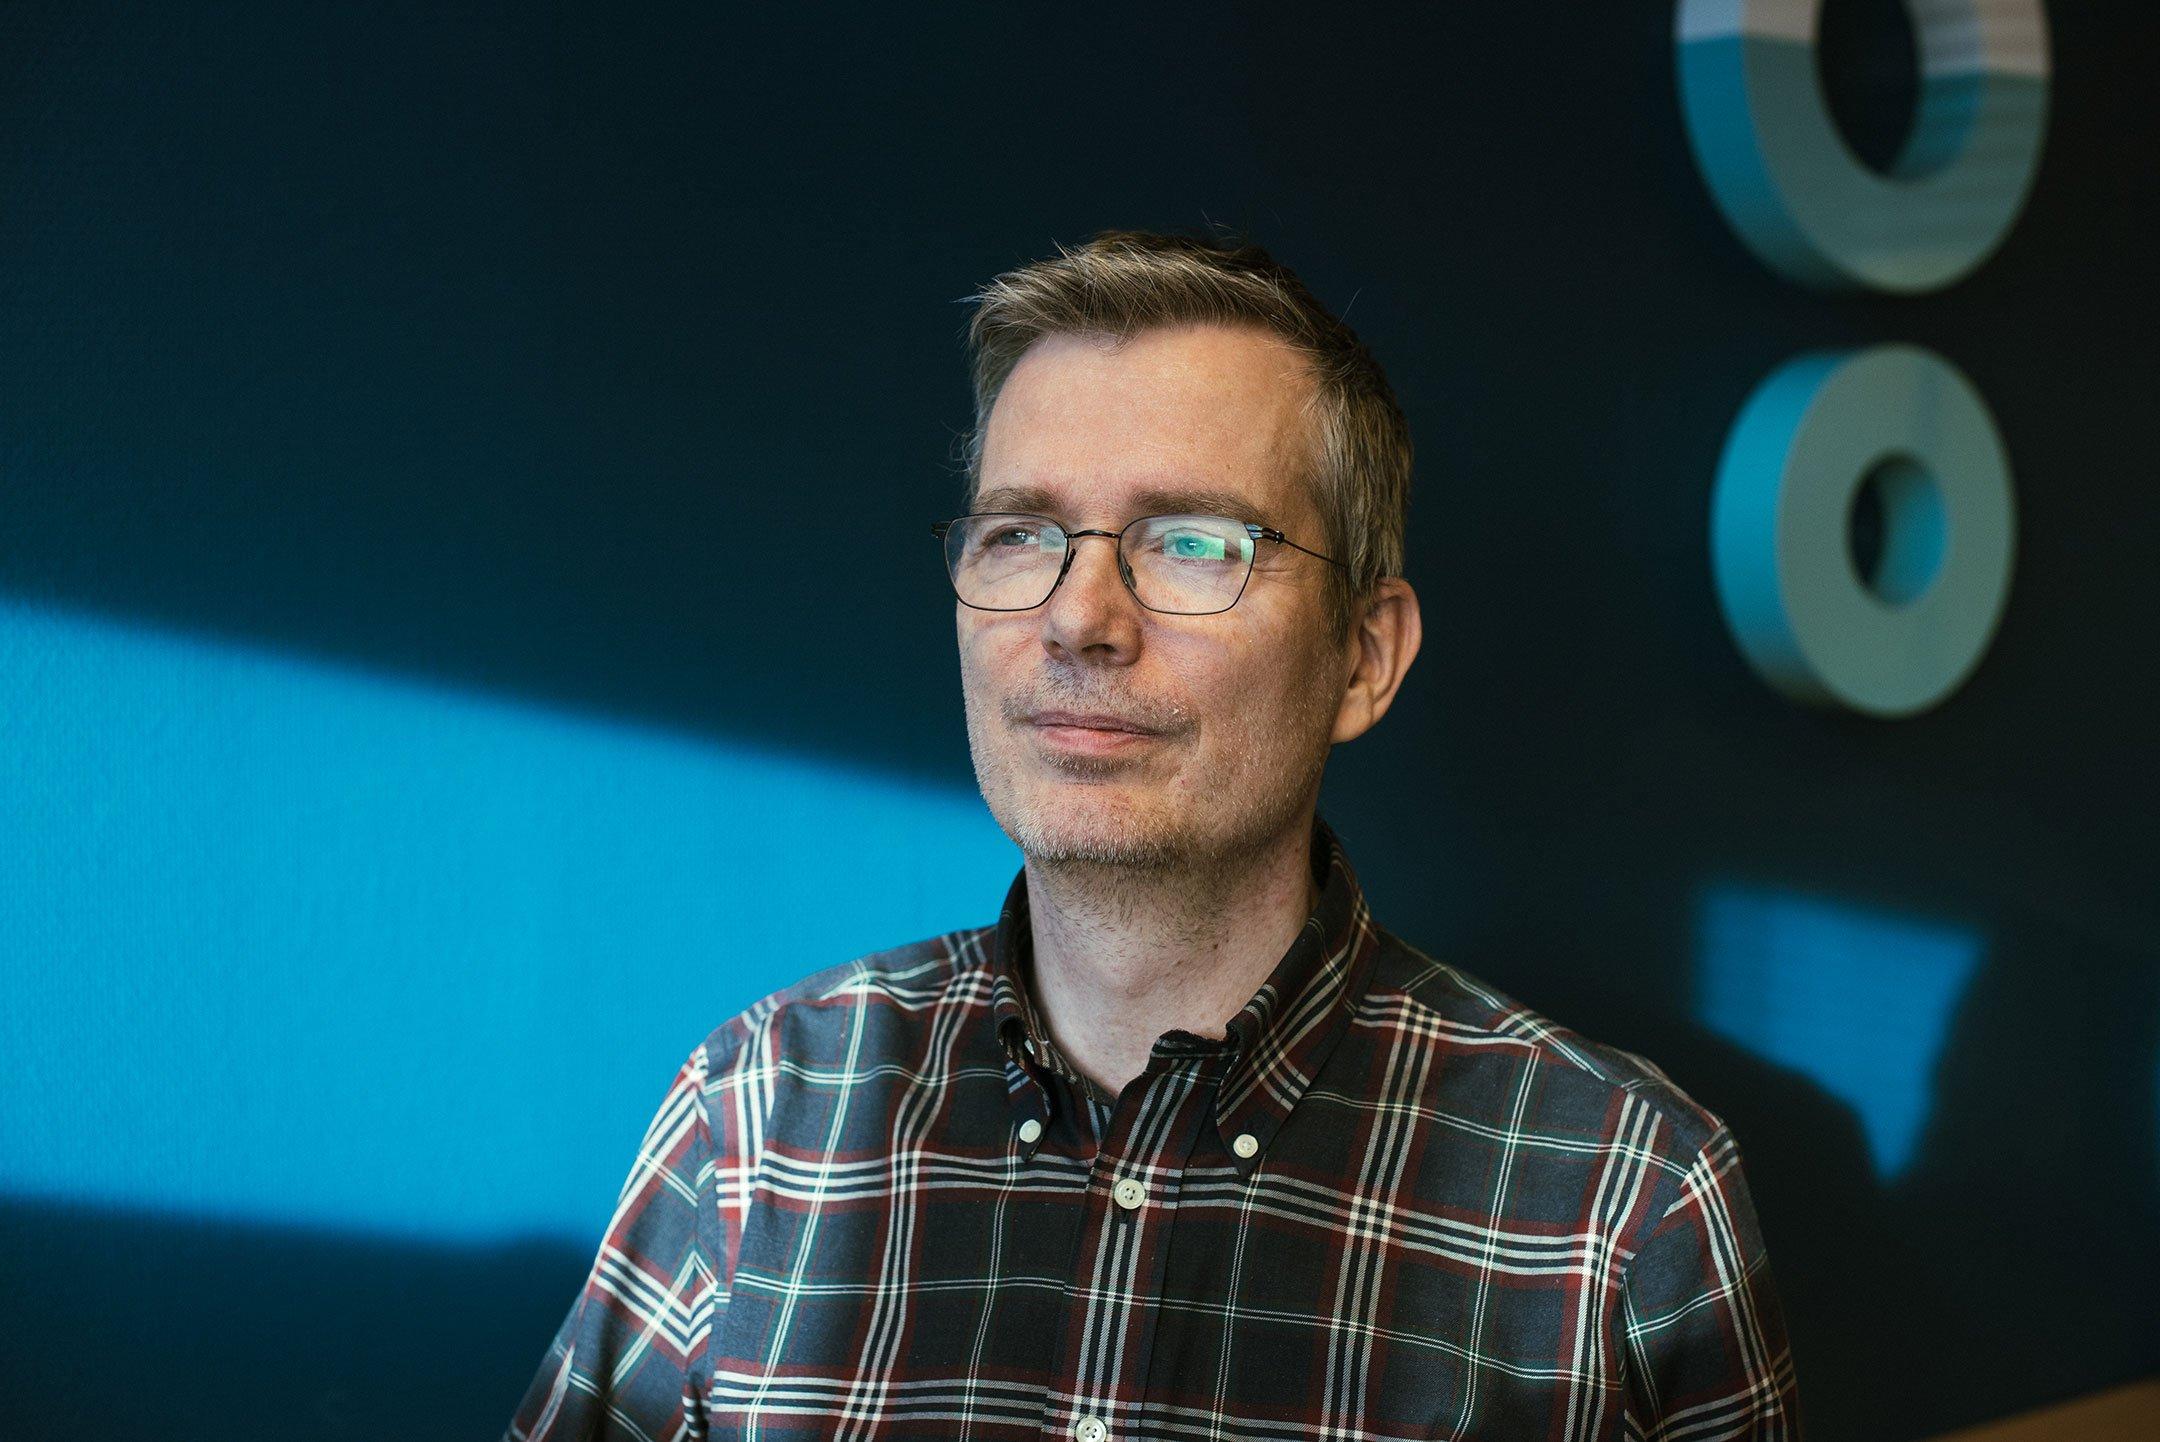 Geir Isene, Head of Innovations at Dualog